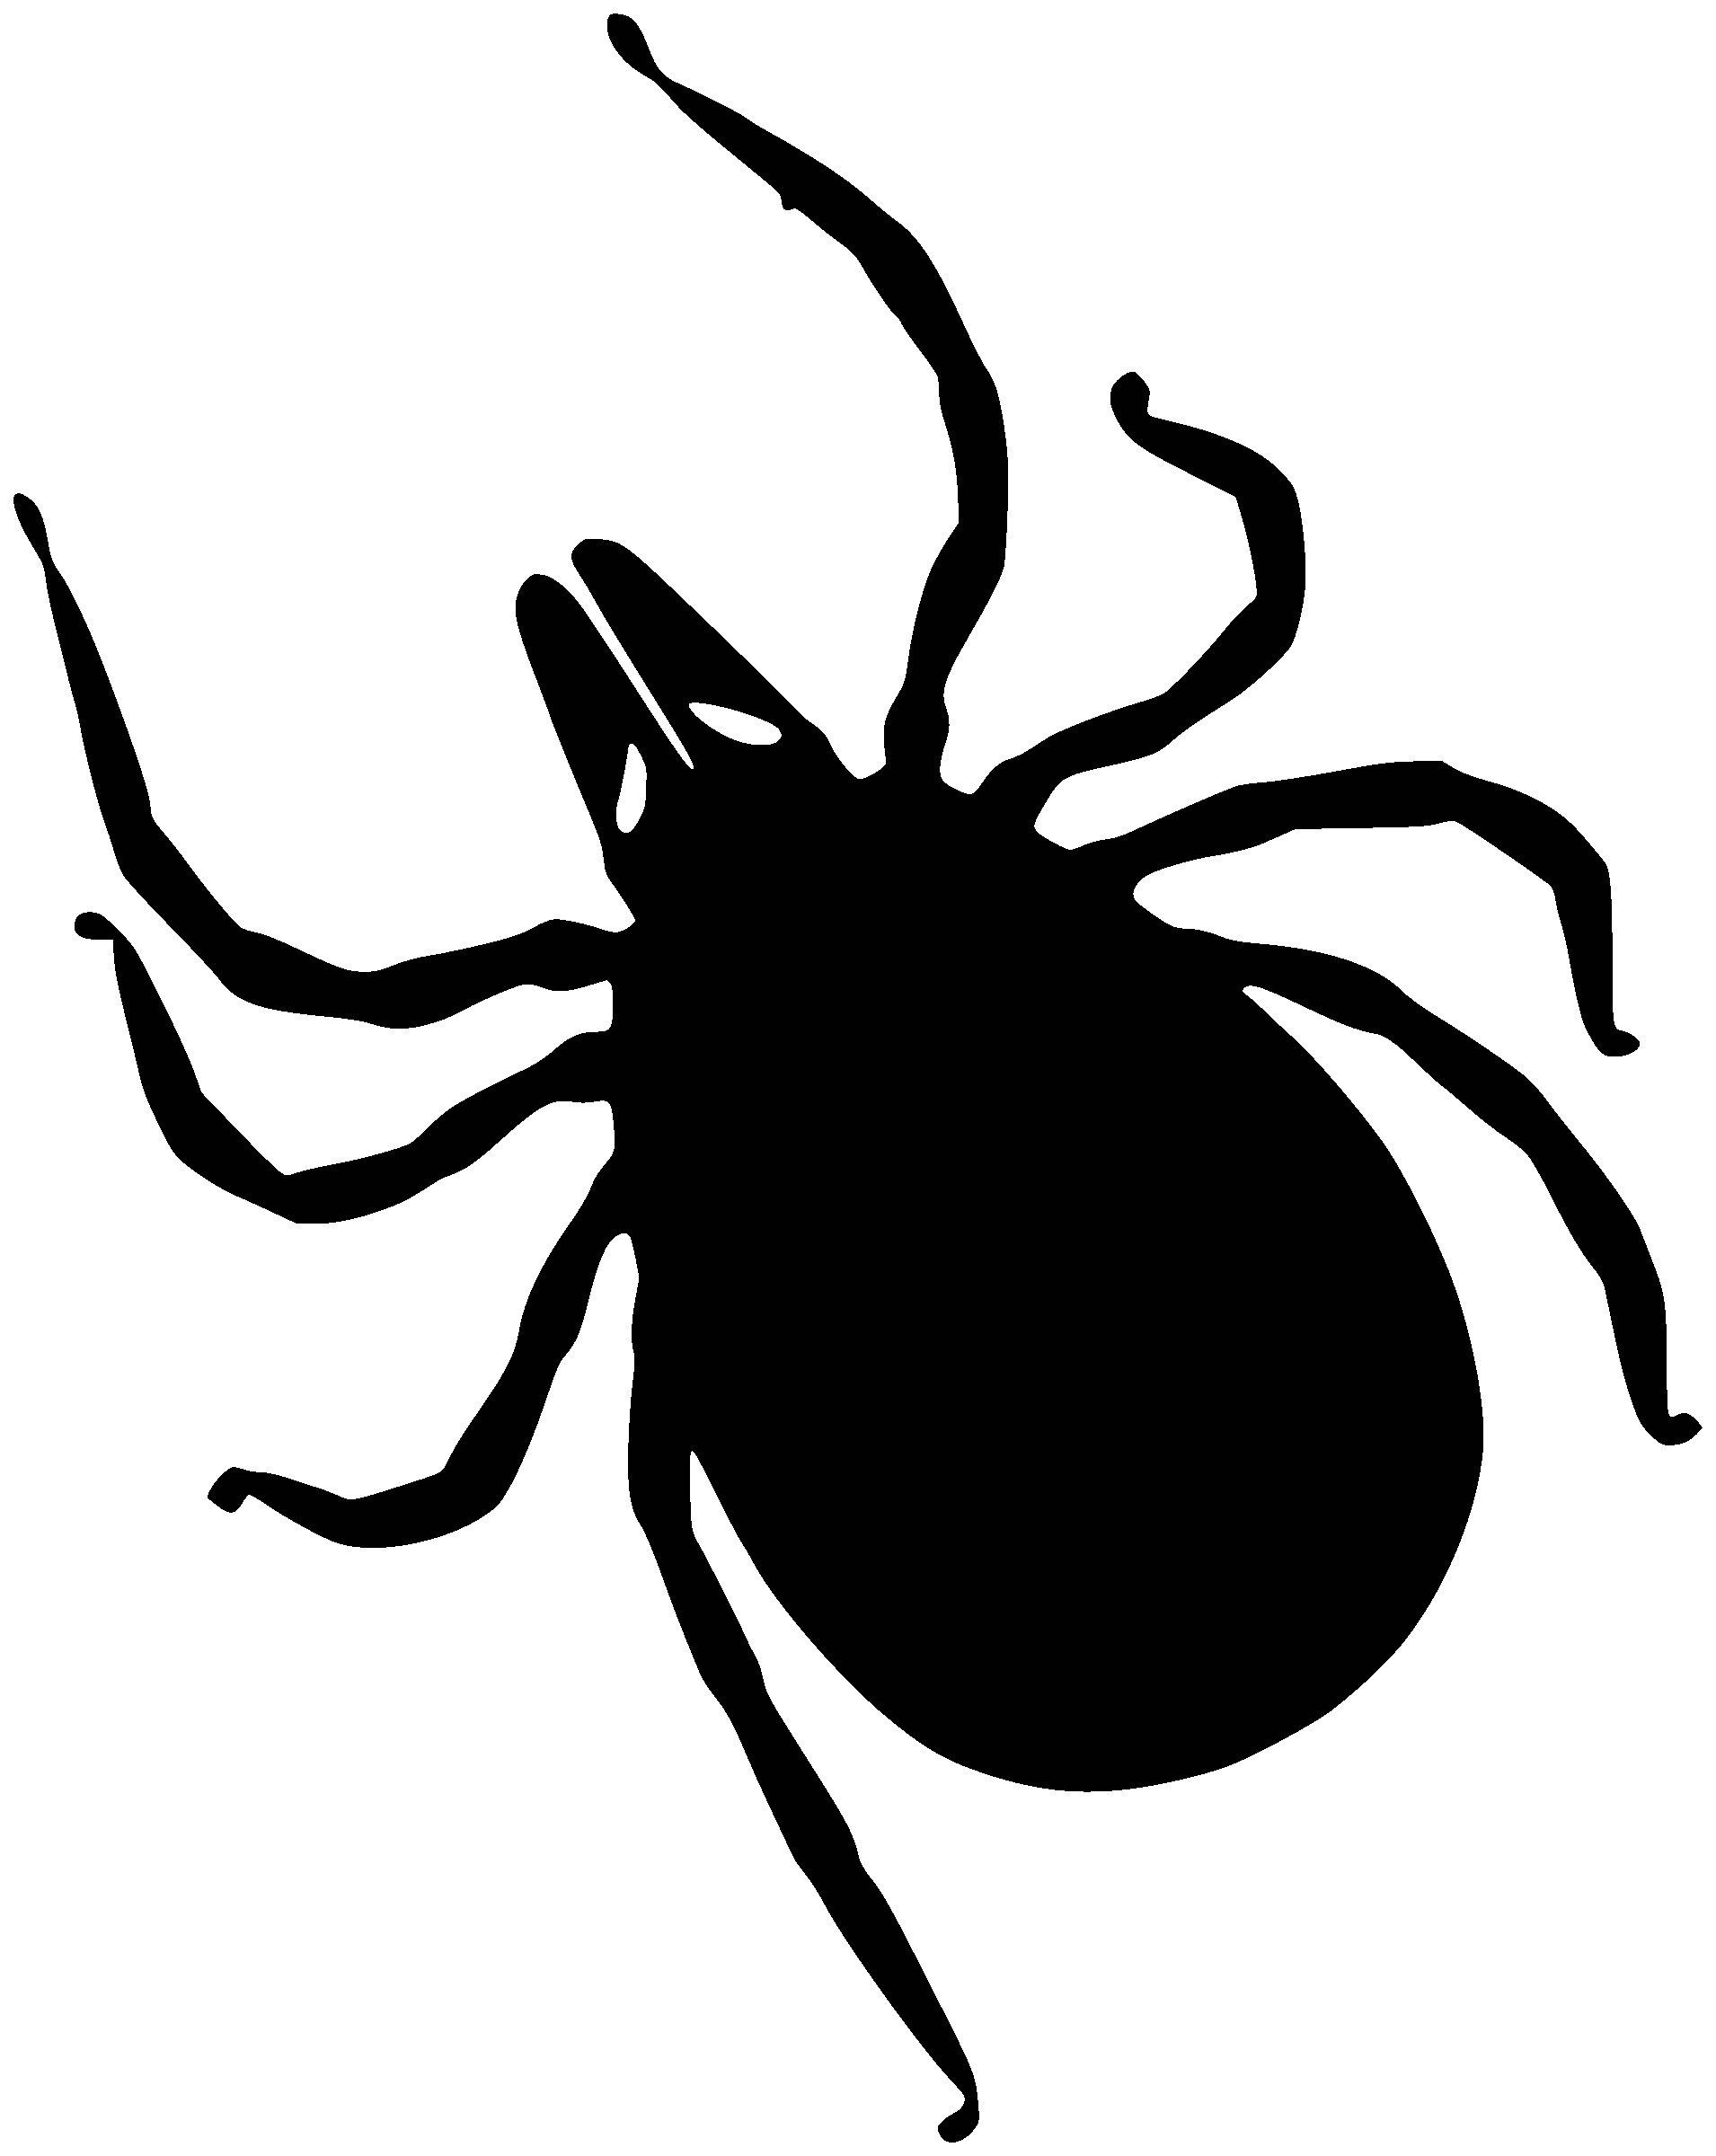 Tick paracite clipart image transparent Tick Clipart for free download – Free Clipart Images image transparent